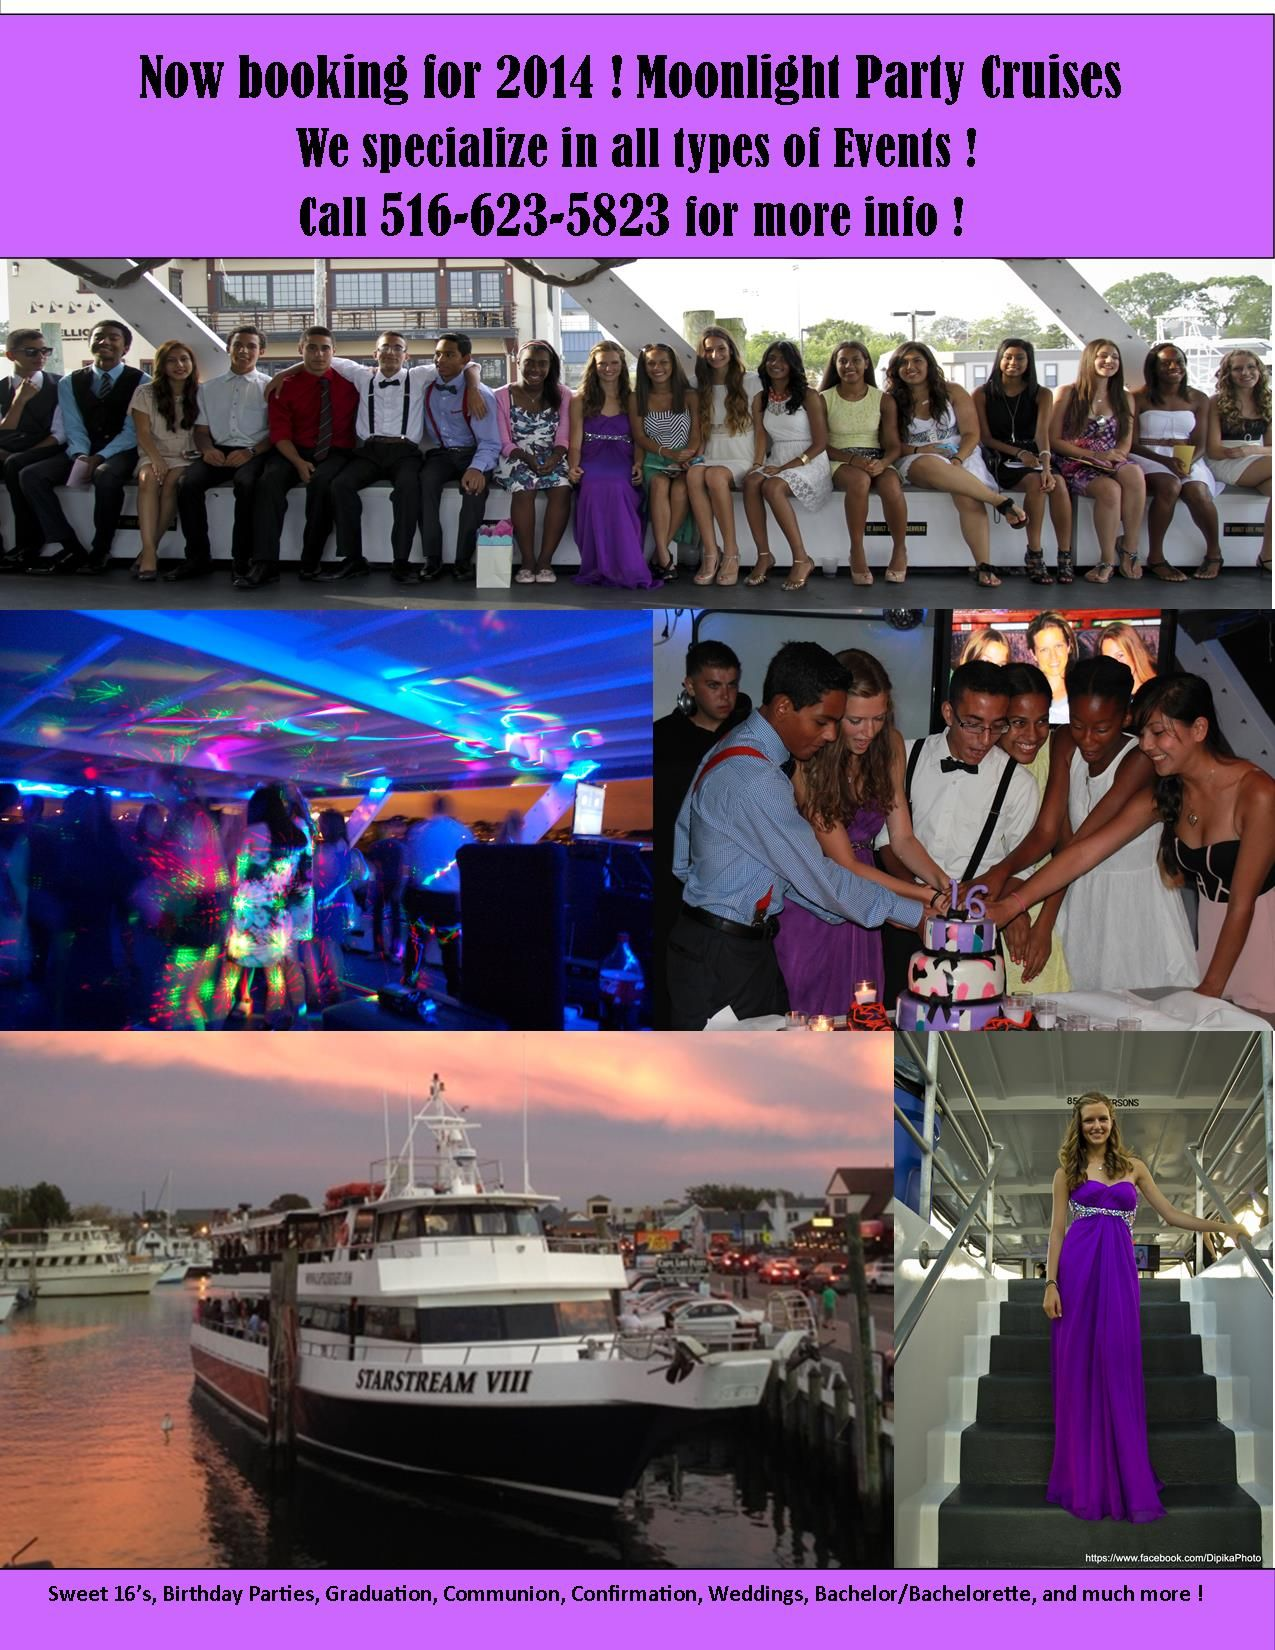 Moonlight Party Cruises Aboard The Captain Lou Fleet Freeport New York Boat LongIsland Sweet Sixteen Venue Sweet16 Birthday Ideas